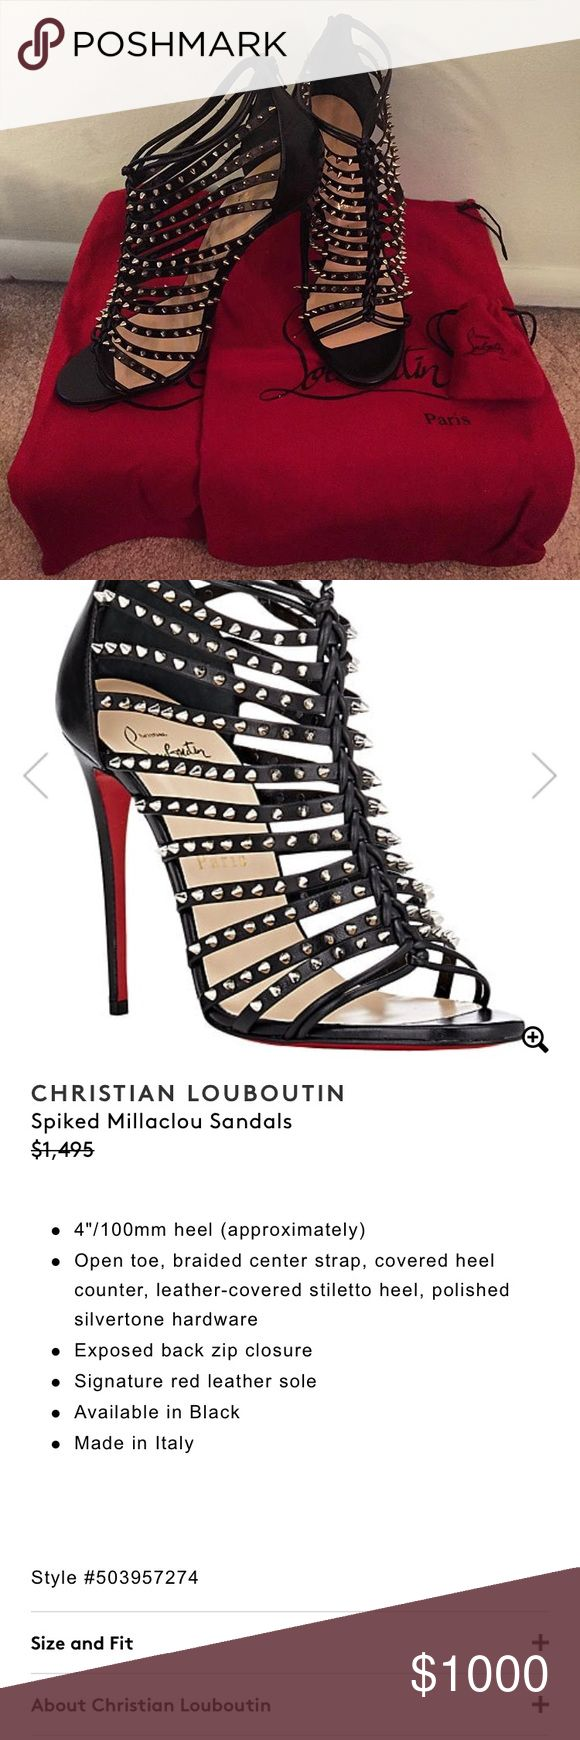 d92717f051e9 christian louboutin black pumps shoes long heels red bottom lyrics ...